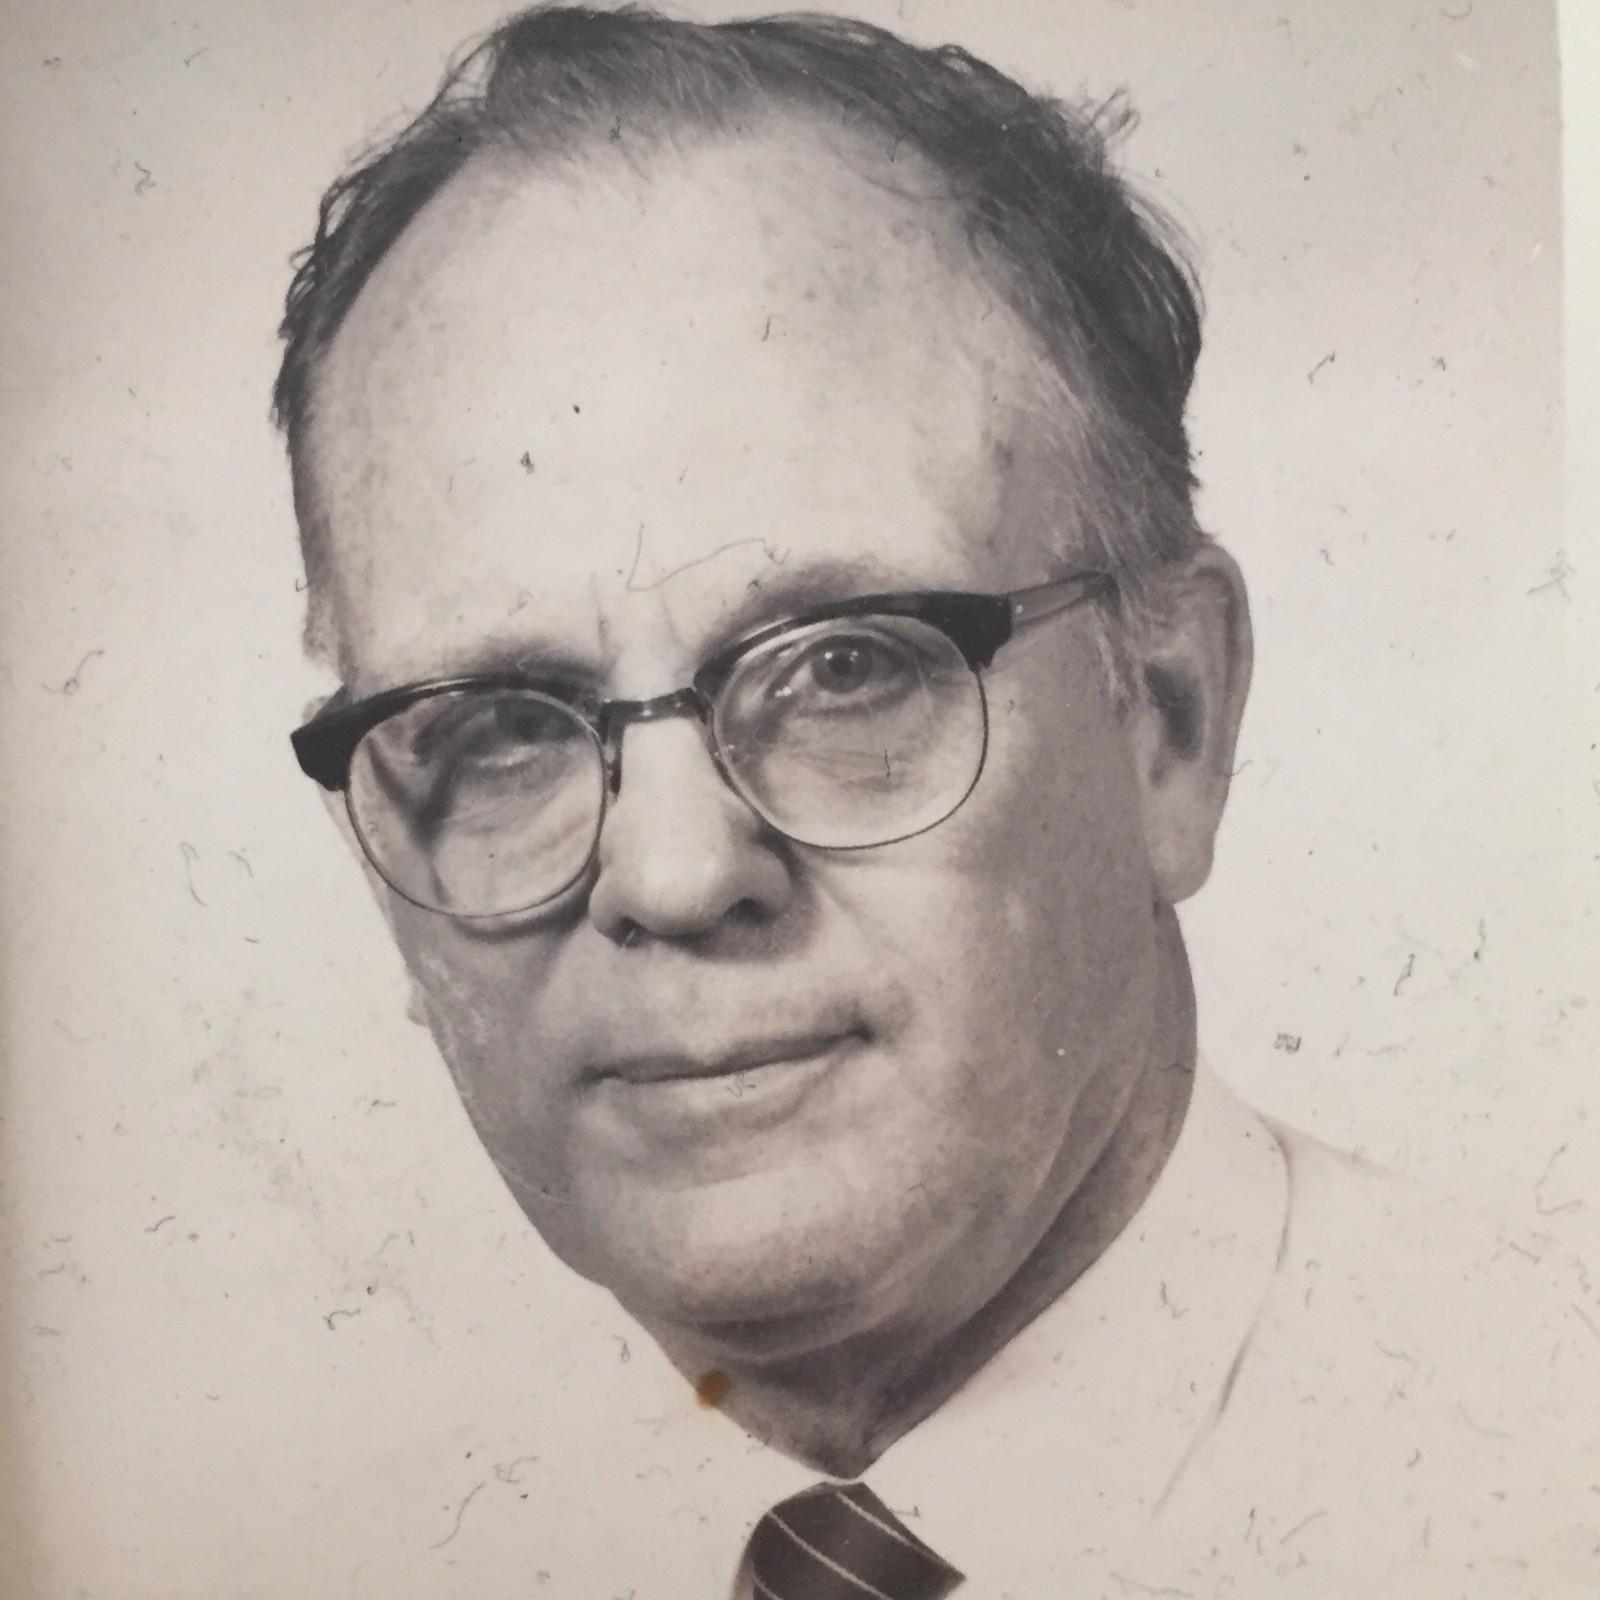 Donald Crawford